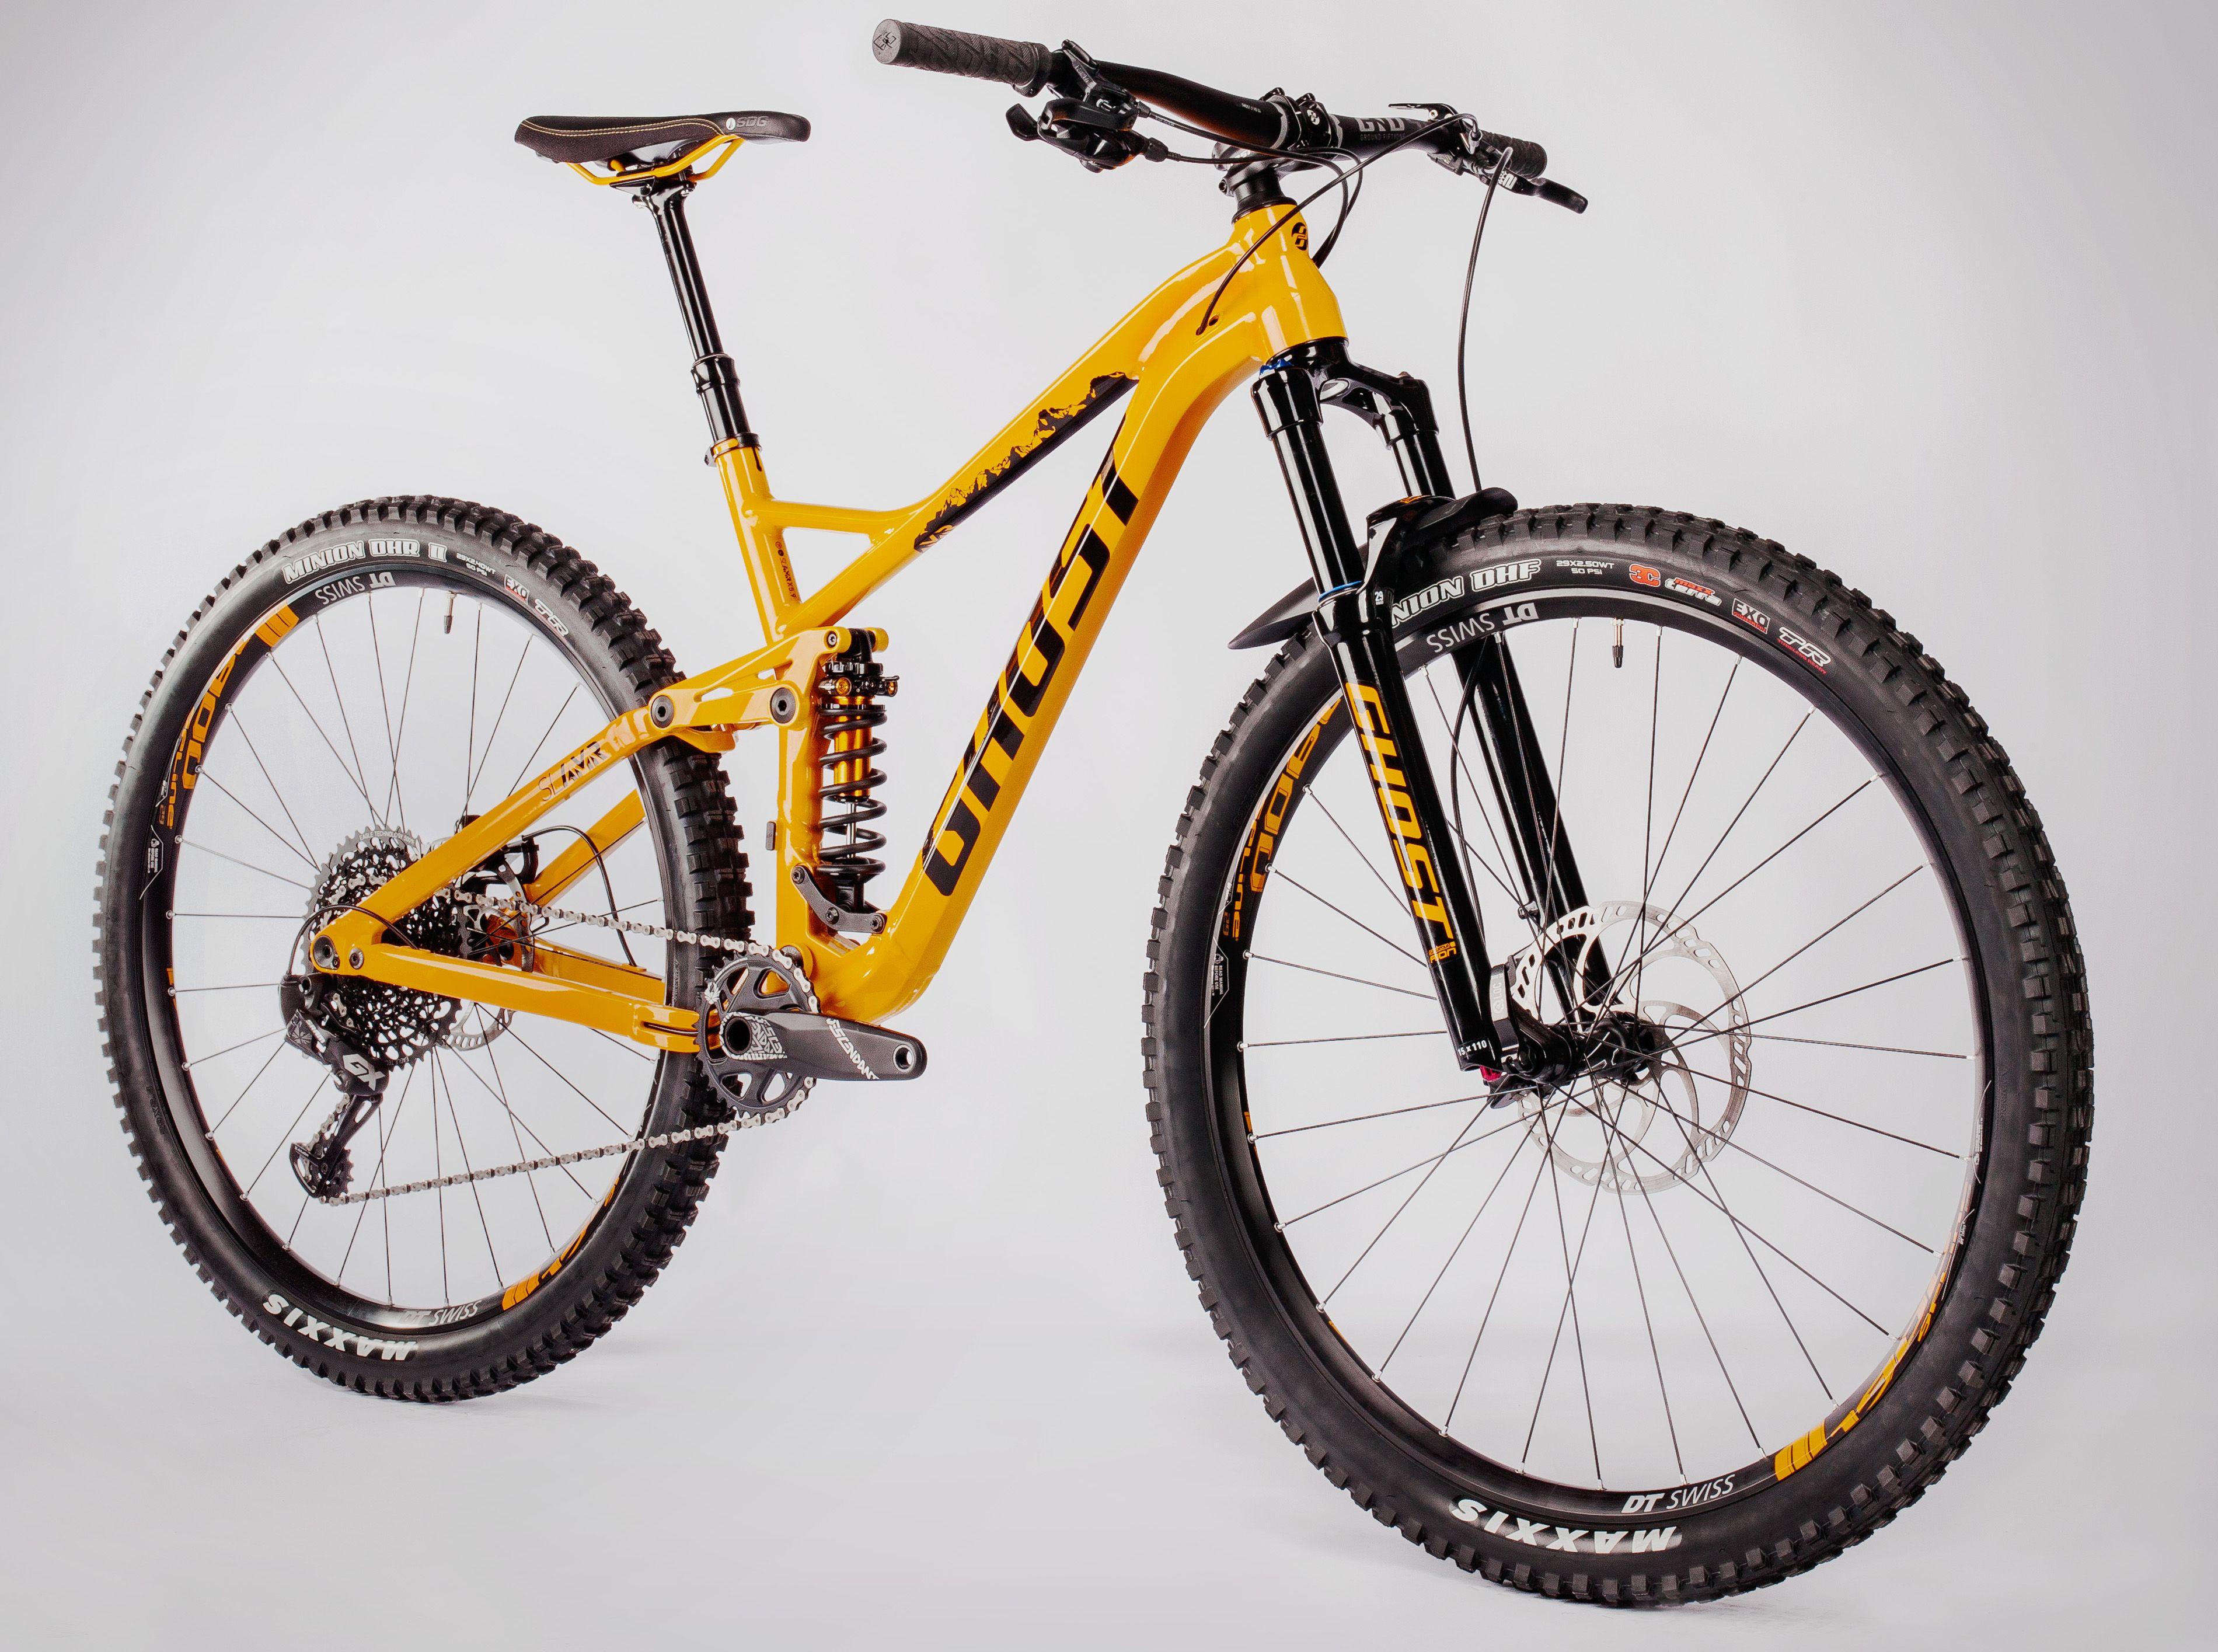 Ghost Sl Amr X Al 5 9 2018 3800x2830 Mtb Bike Enduro Mtb Bicycle